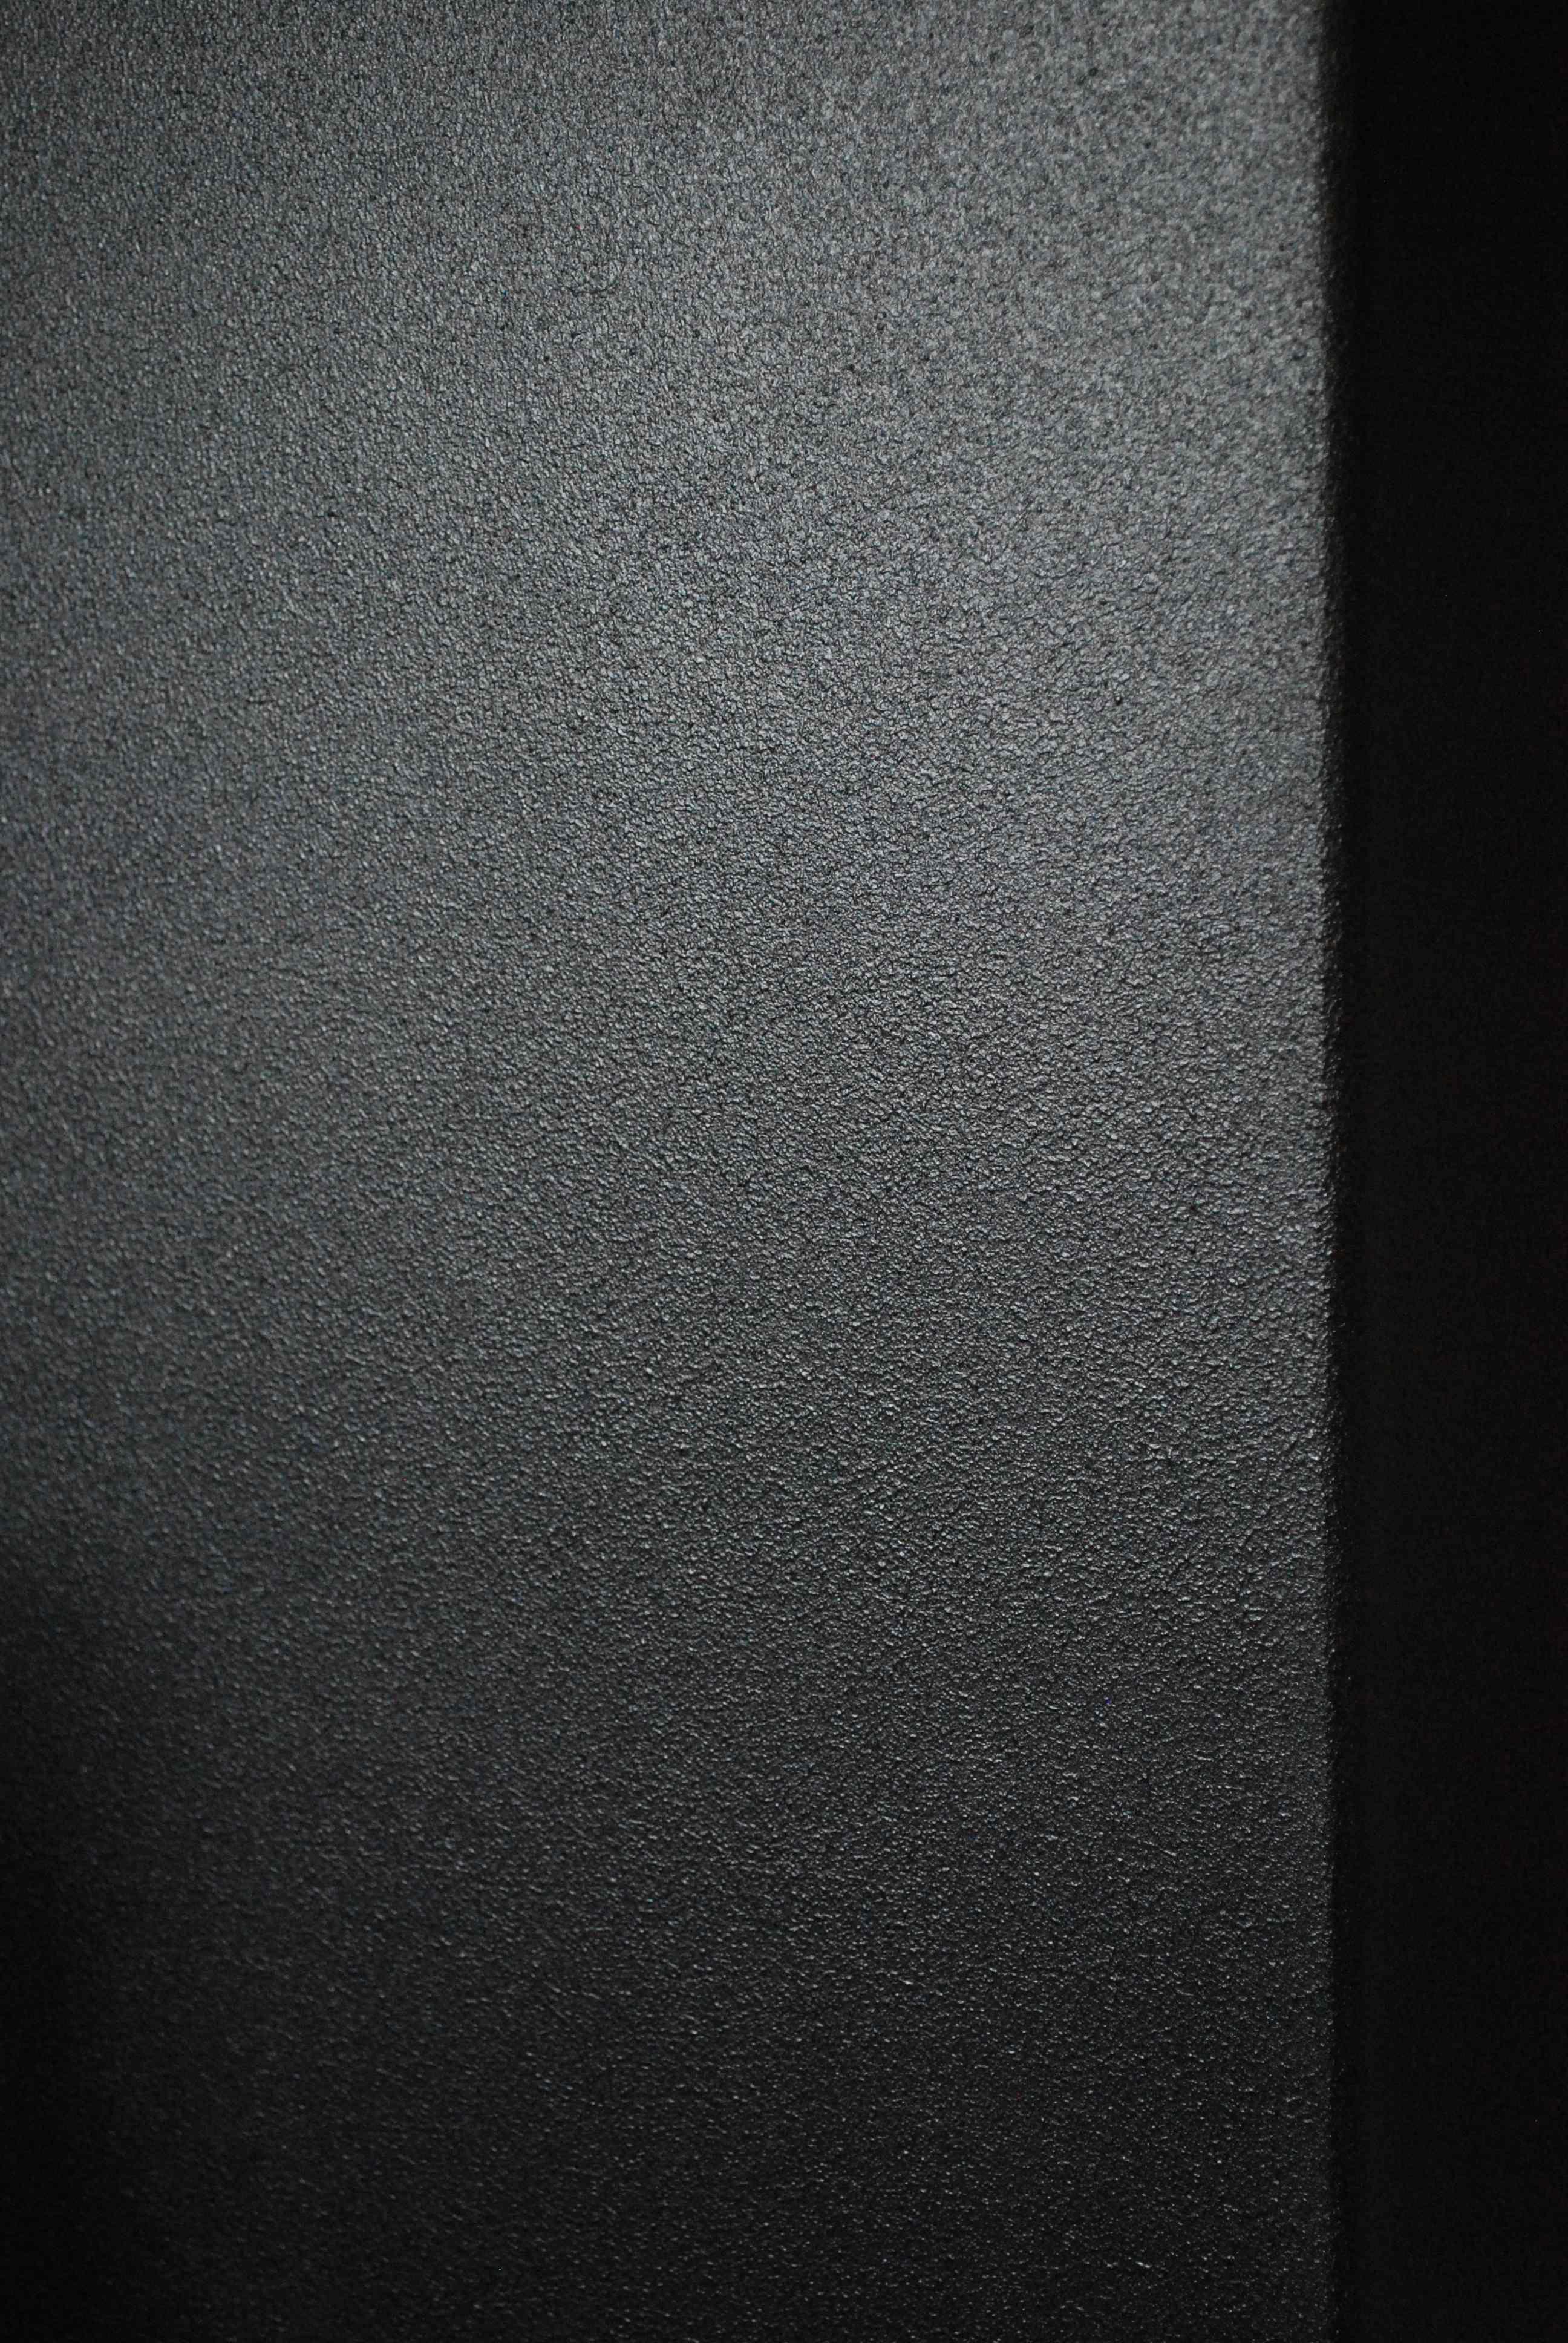 Almost flat low sheen black paint Techtalk Speaker Building